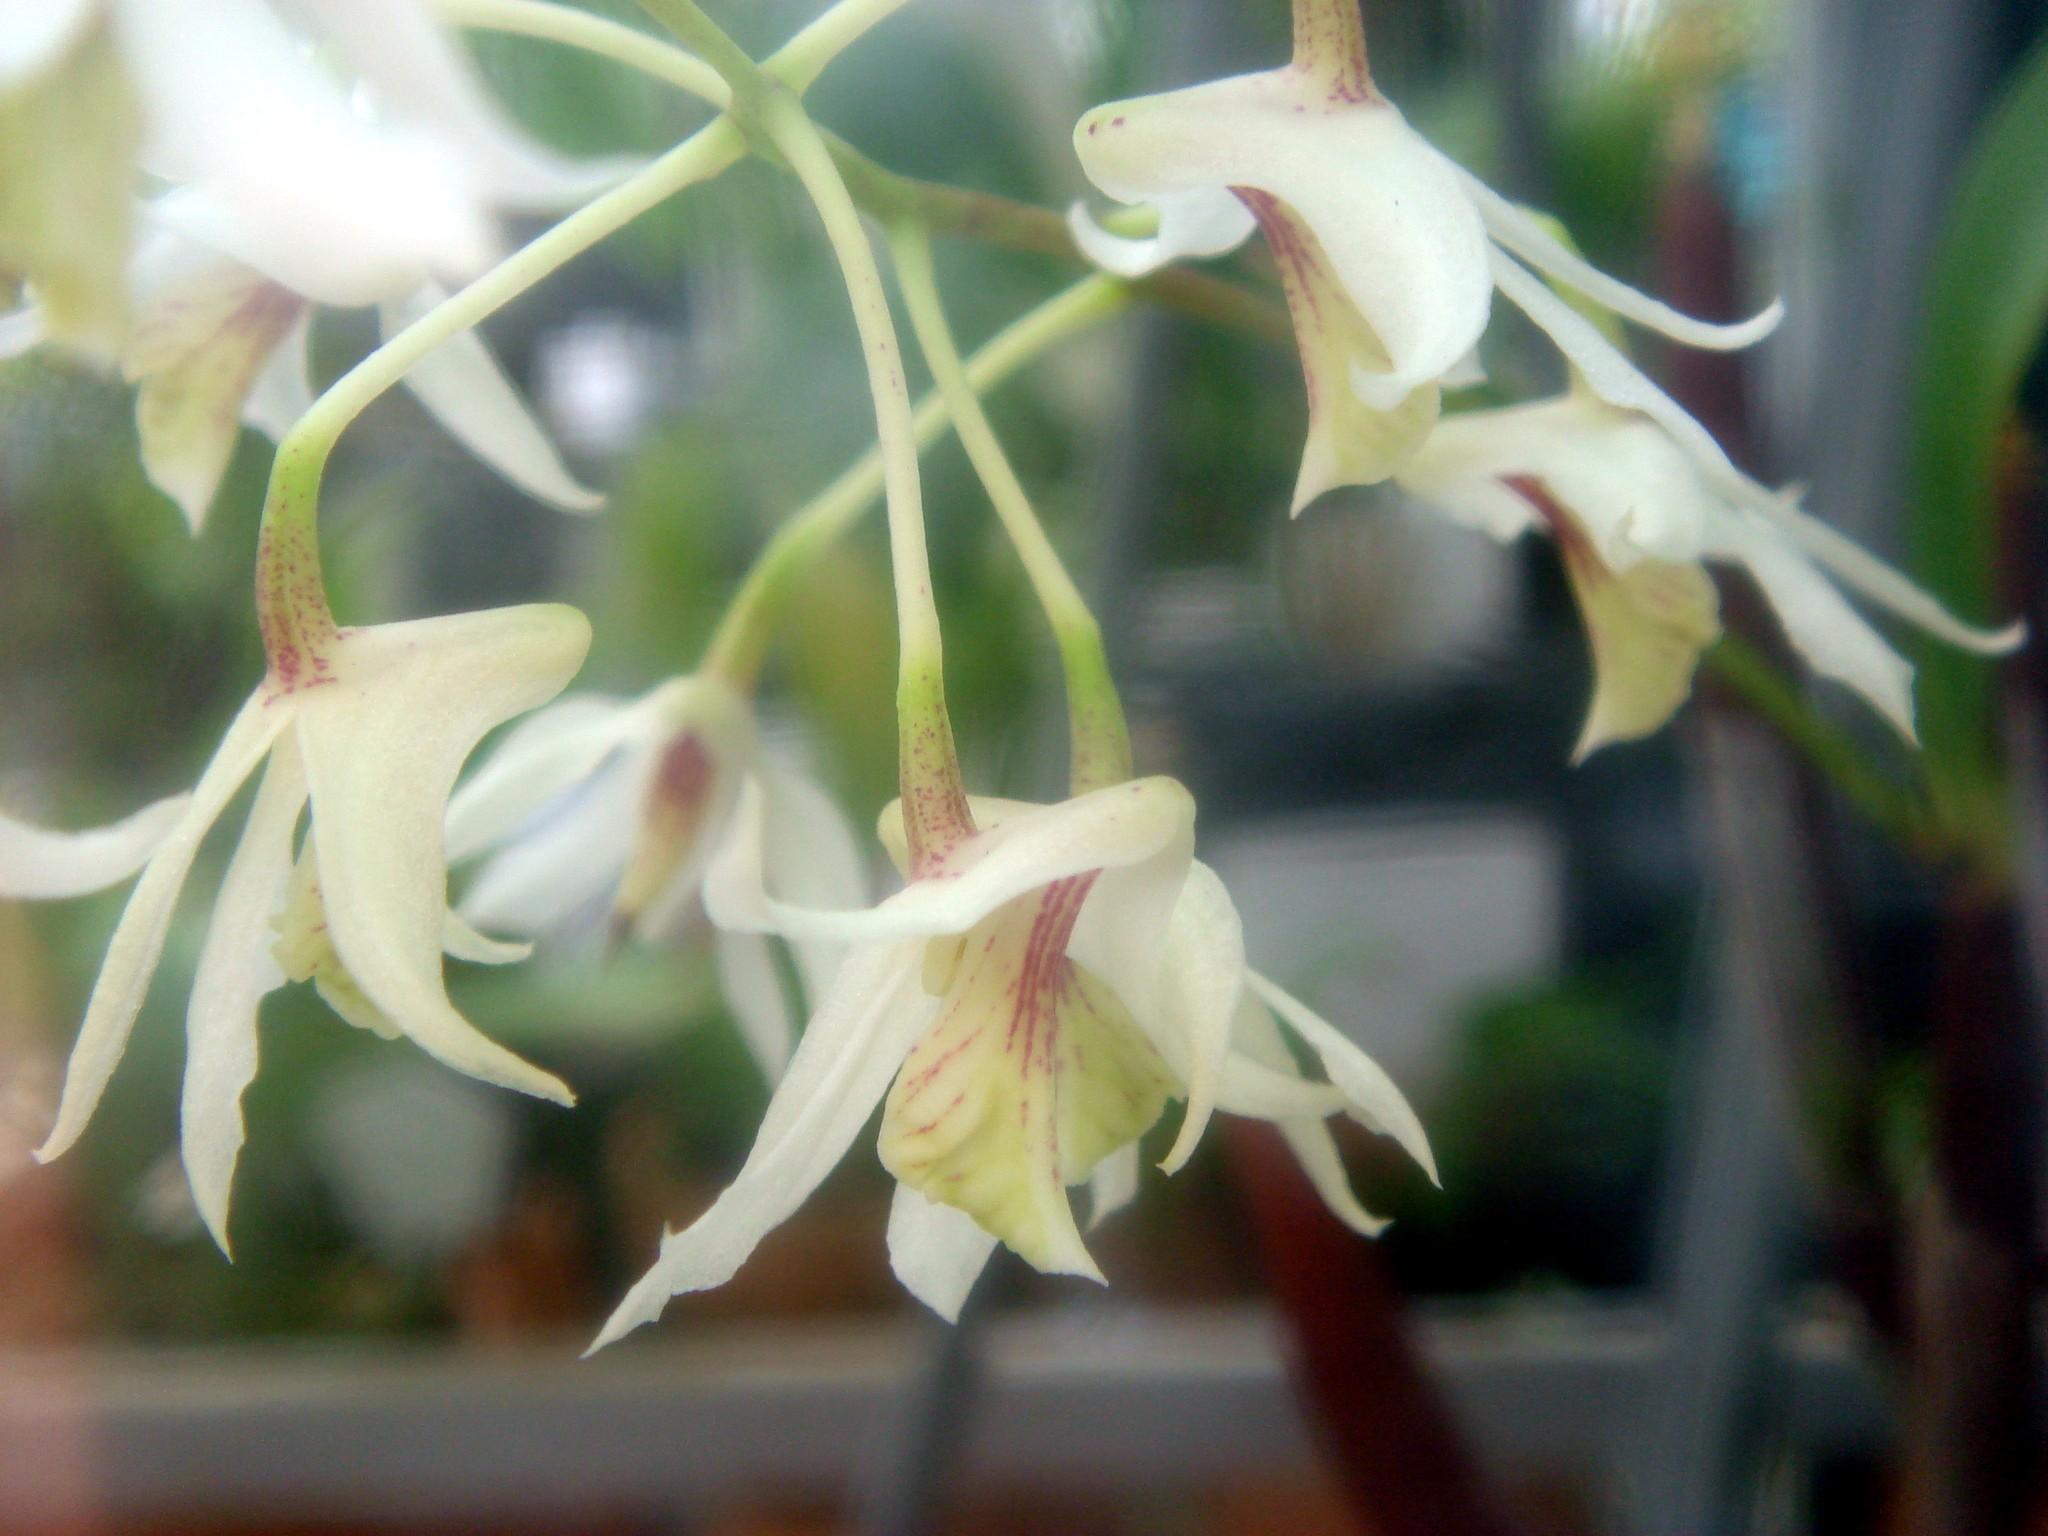 http://orchids.la.coocan.jp/Dendrobium/Dendrobium%20wisselense/DSC02651.JPG